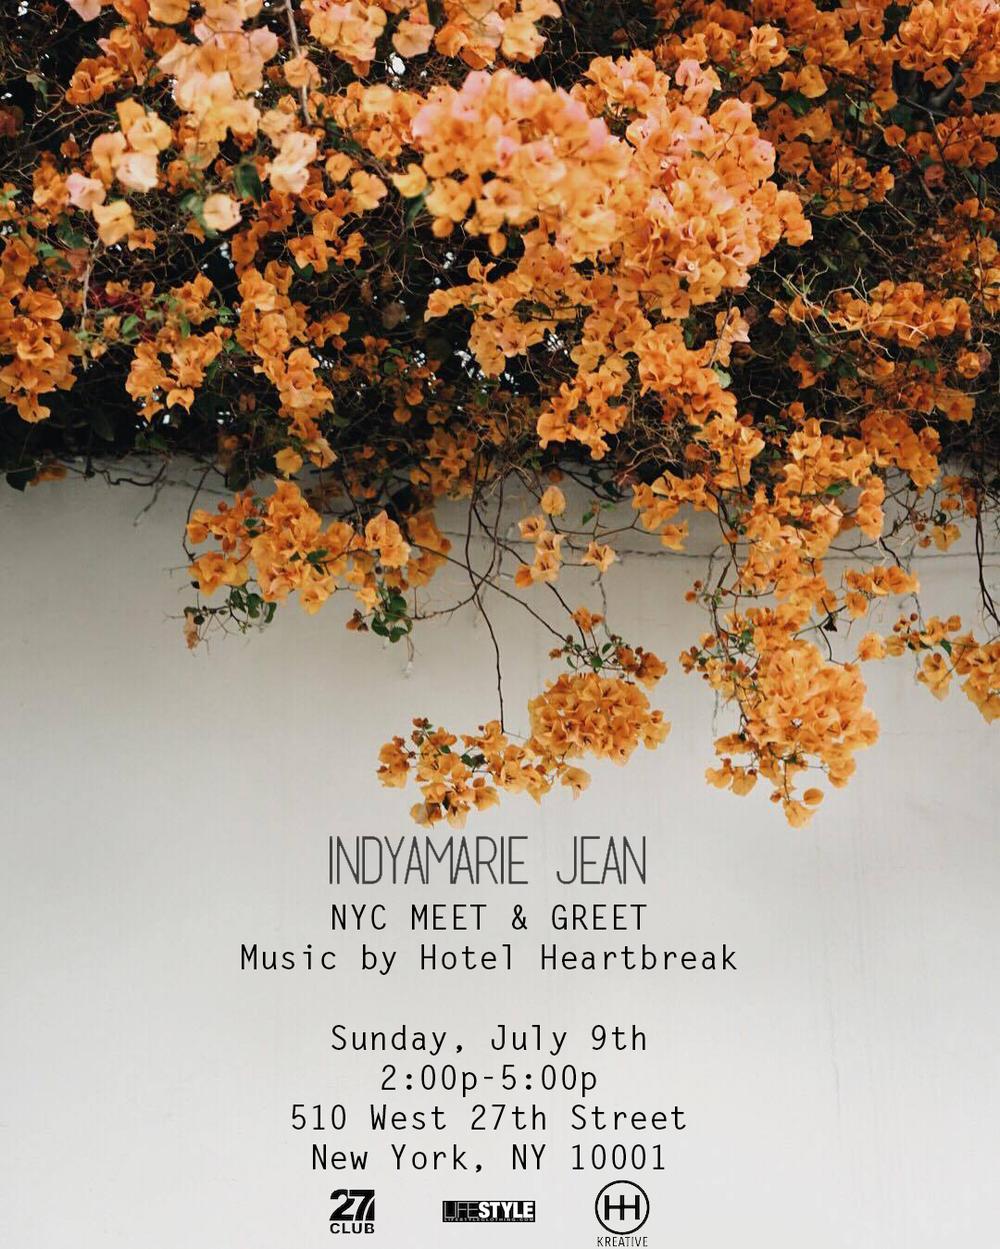 New York City Meet & Greet - July 9th, 2017